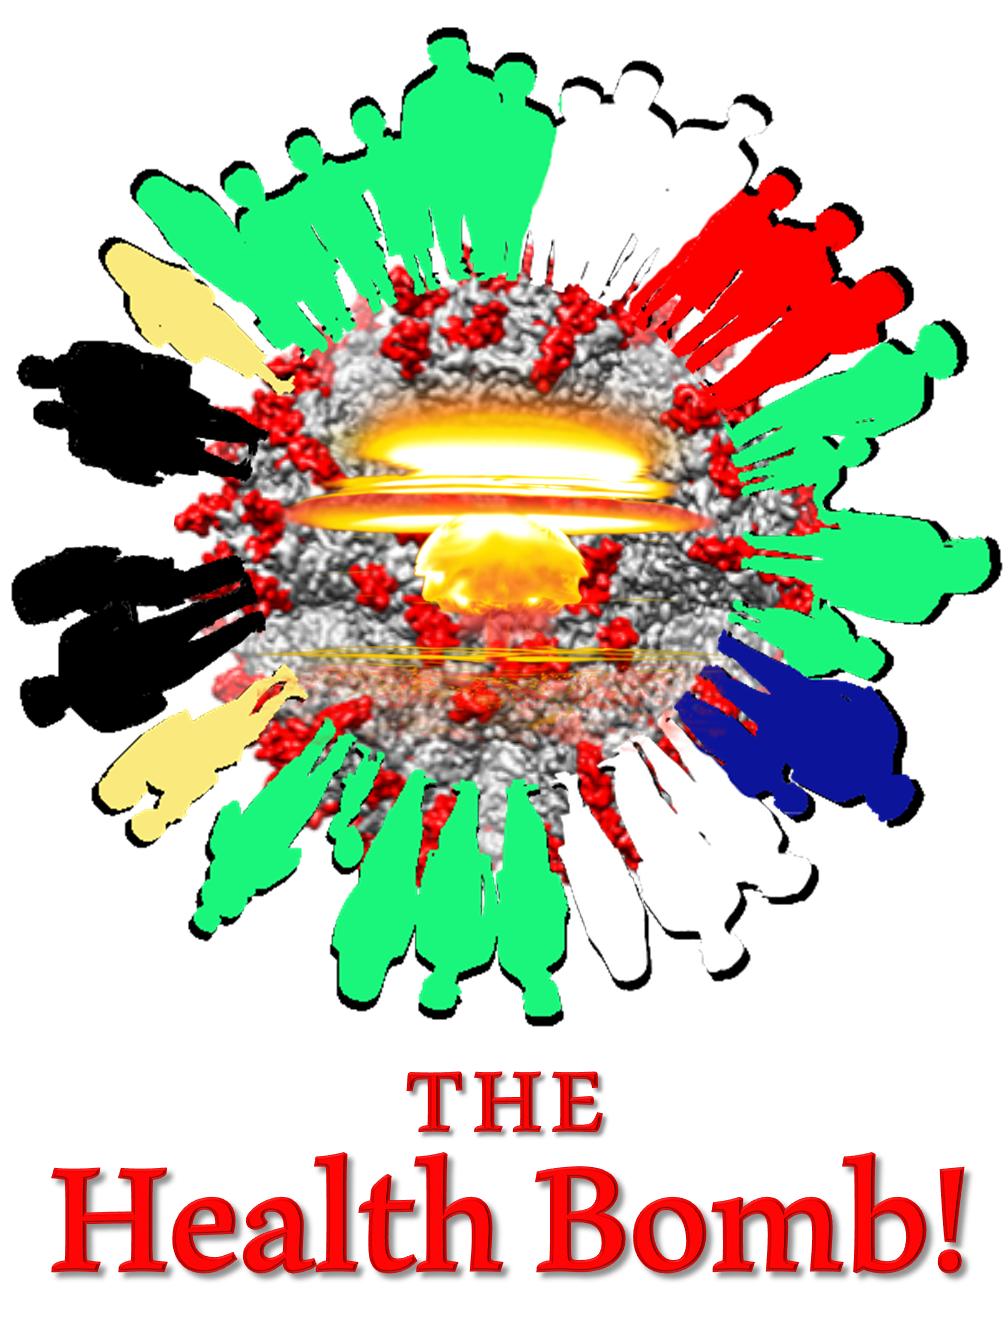 The Health Bomb